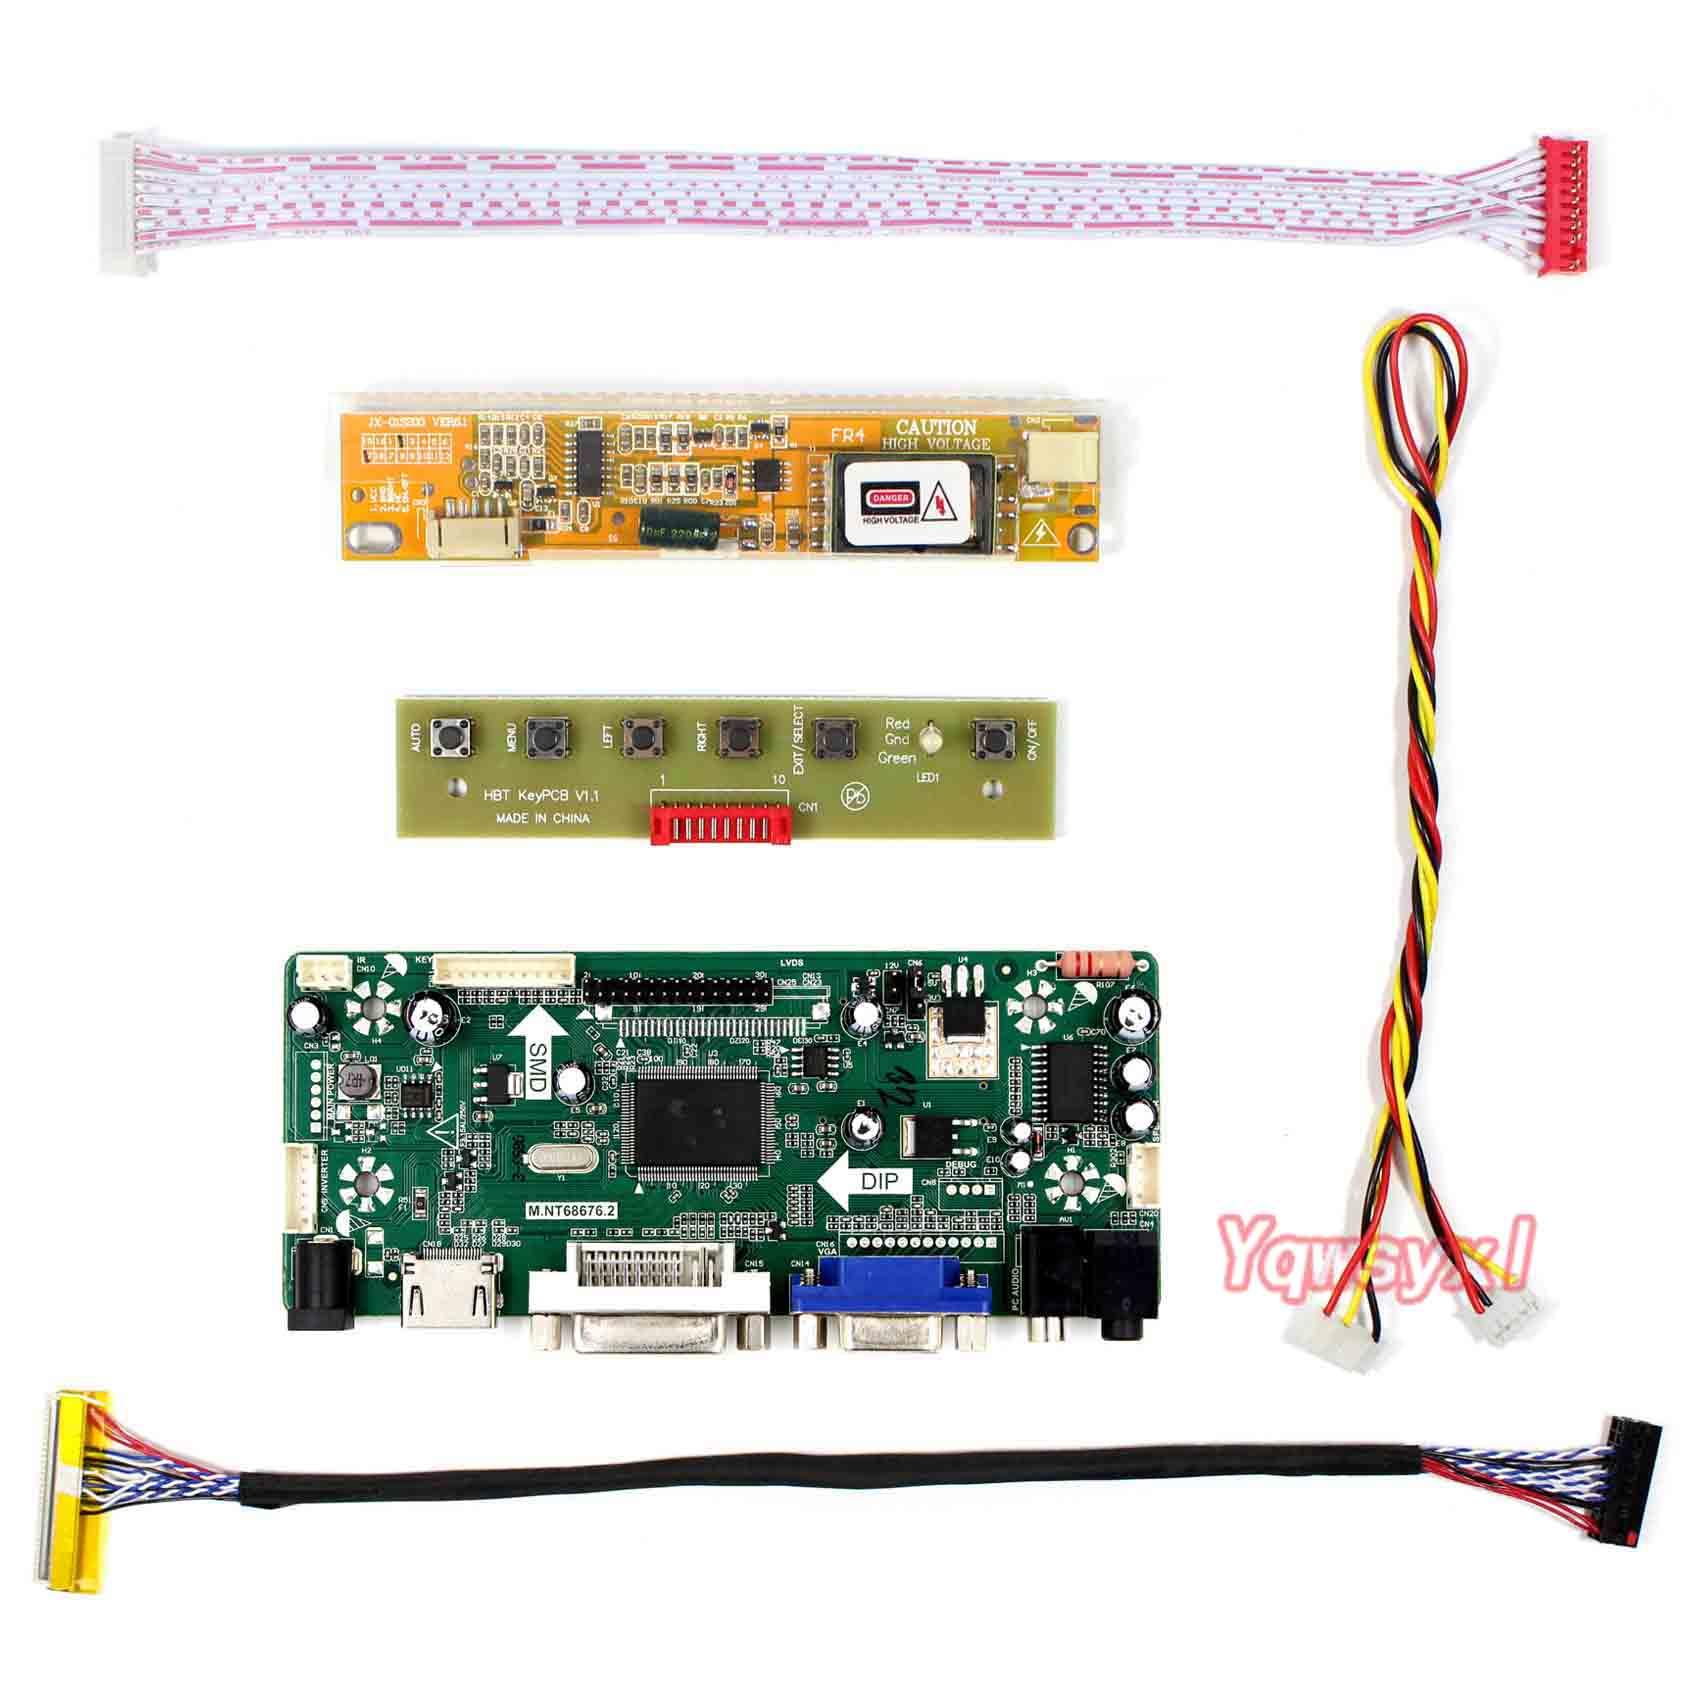 Yqwsyxl Control Board Monitor Kit For  LTN184KT01 HDMI + DVI + VGA LCD LED Screen Controller Board Driver